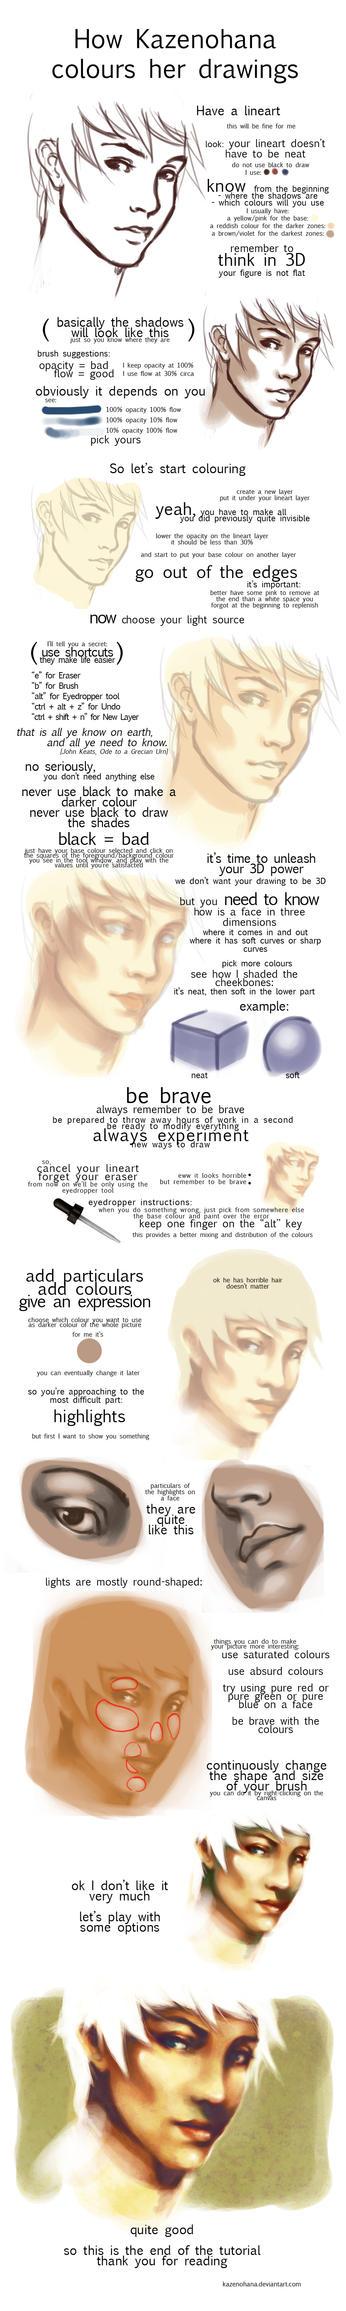 how to colour by KazeNoHana